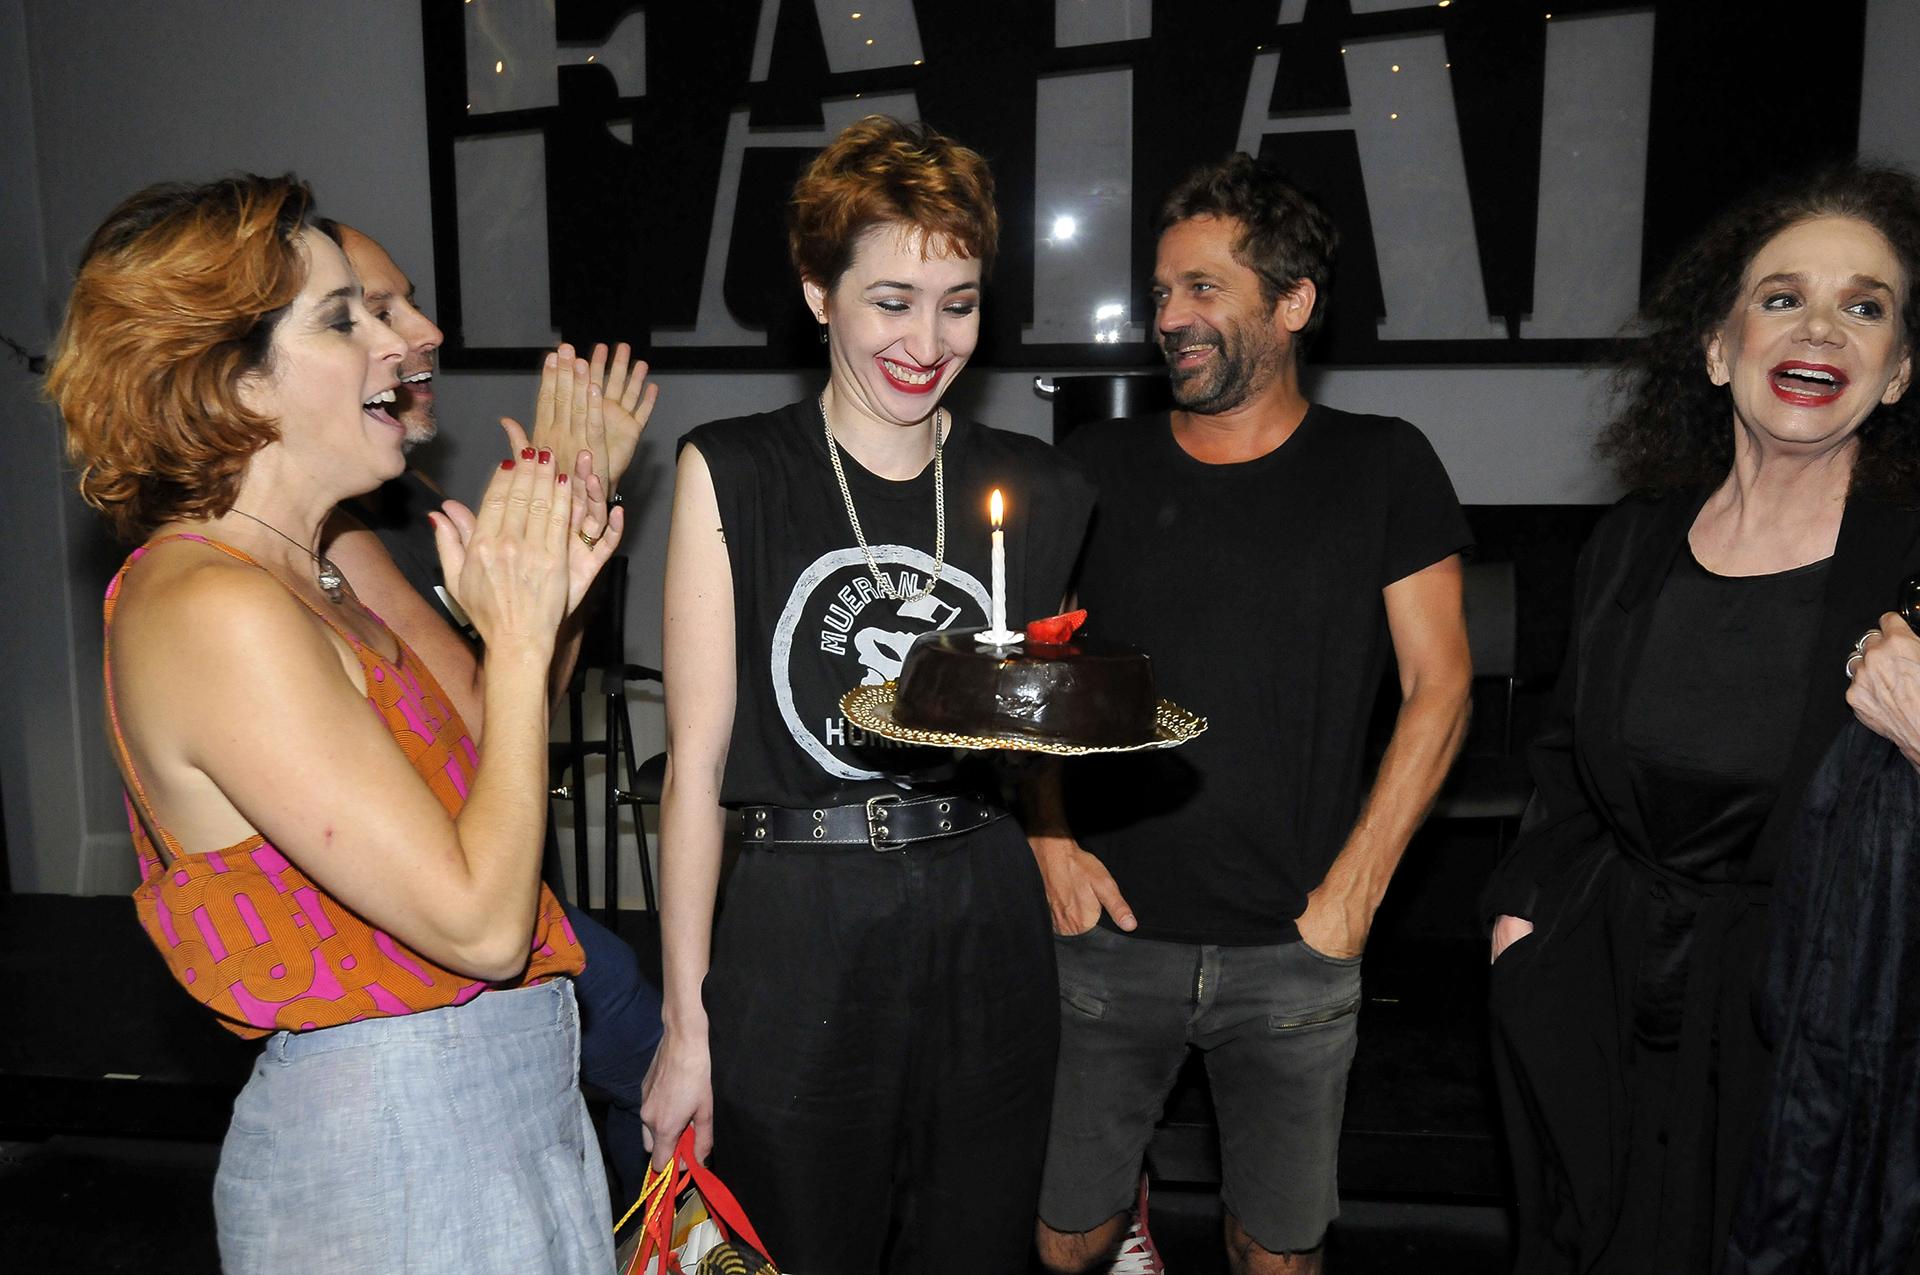 El cumpleaños de Sofía reflejó el buen clima que reina entre los integrantes del elenco